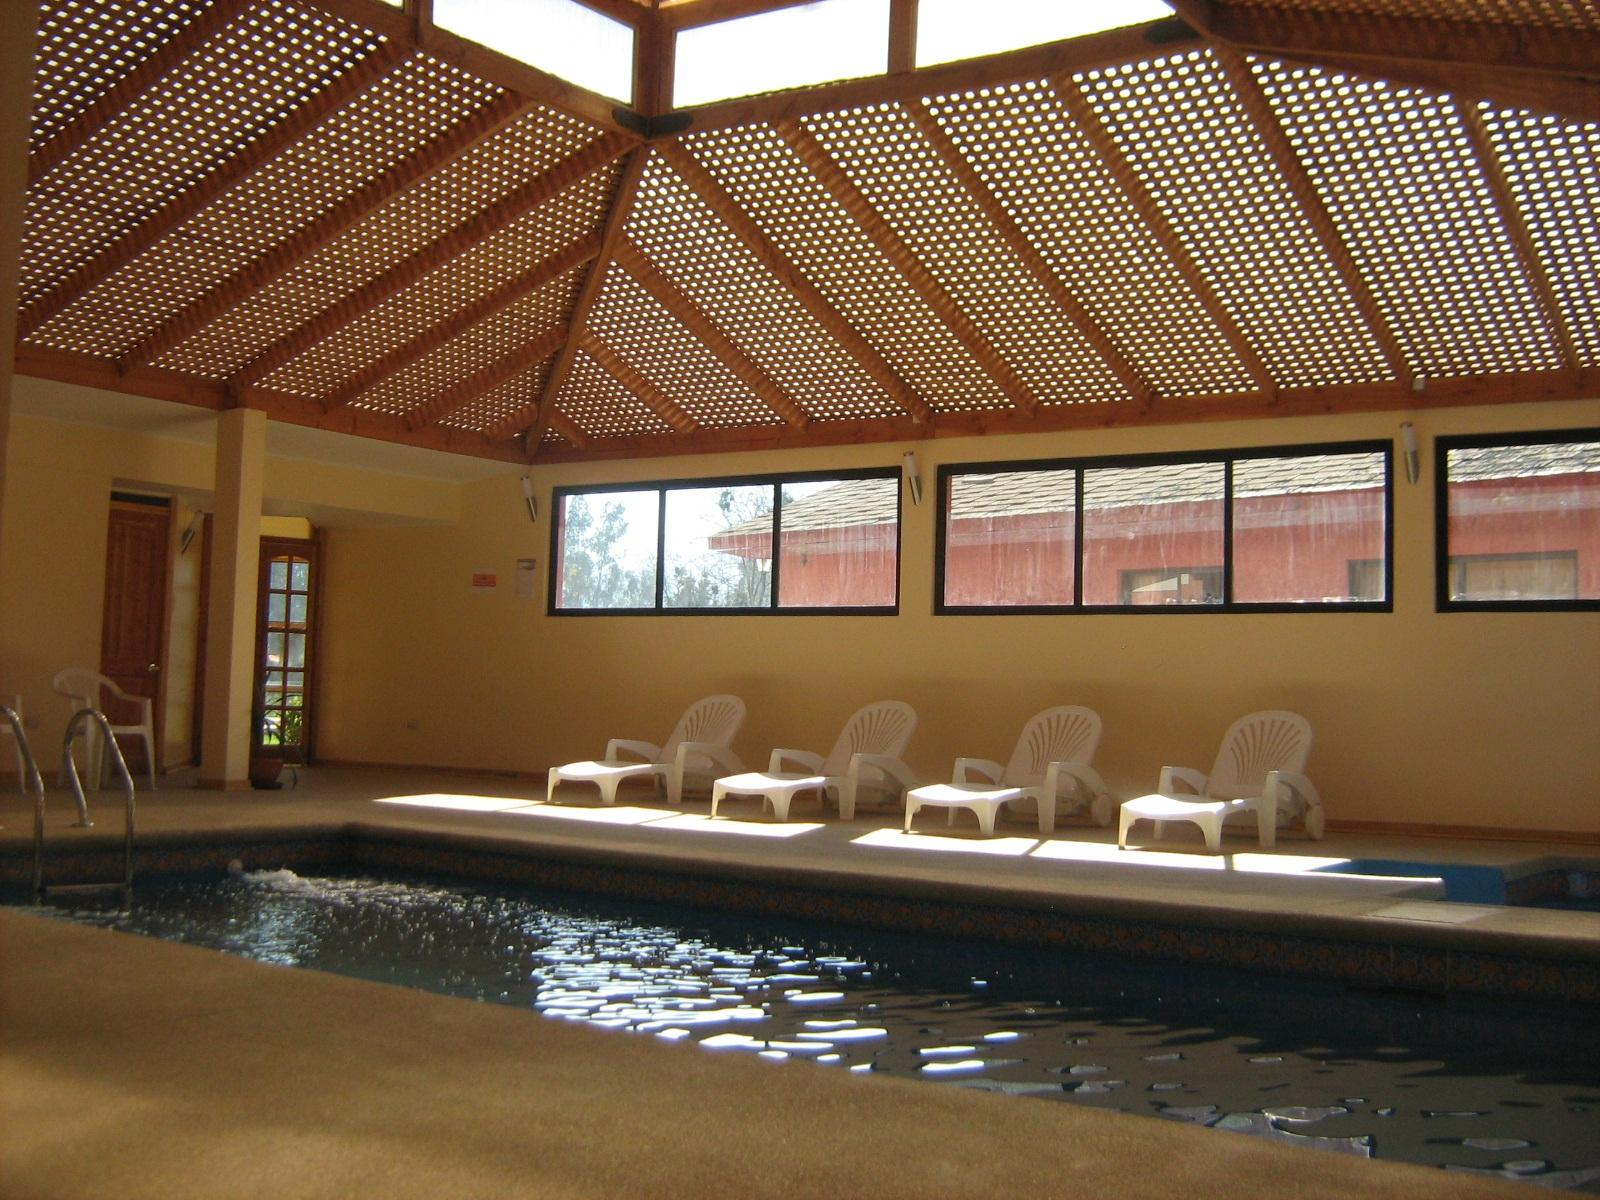 Construccion pascal hermanos ltda for Construccion piscina temperada